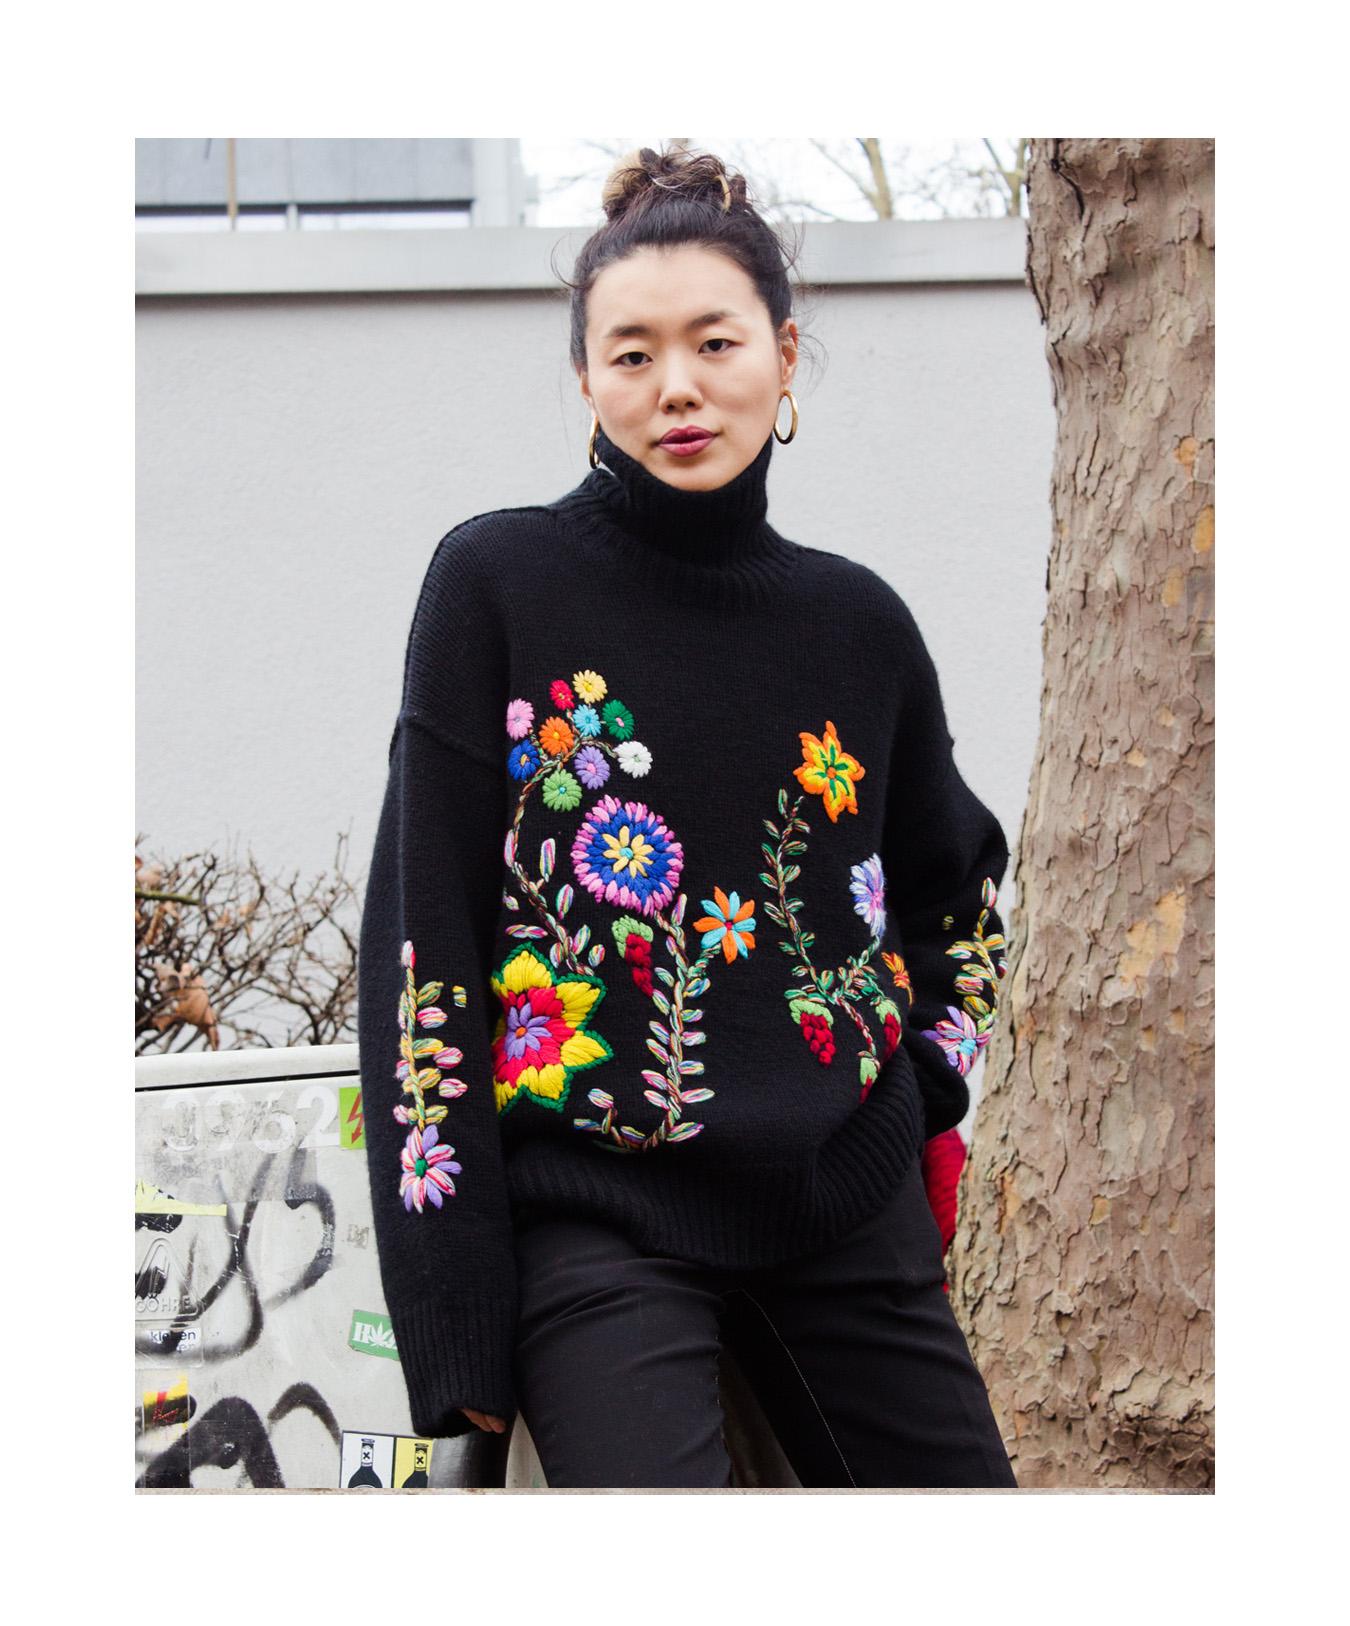 Mandkhai wearing embroidered oversized2 jumper